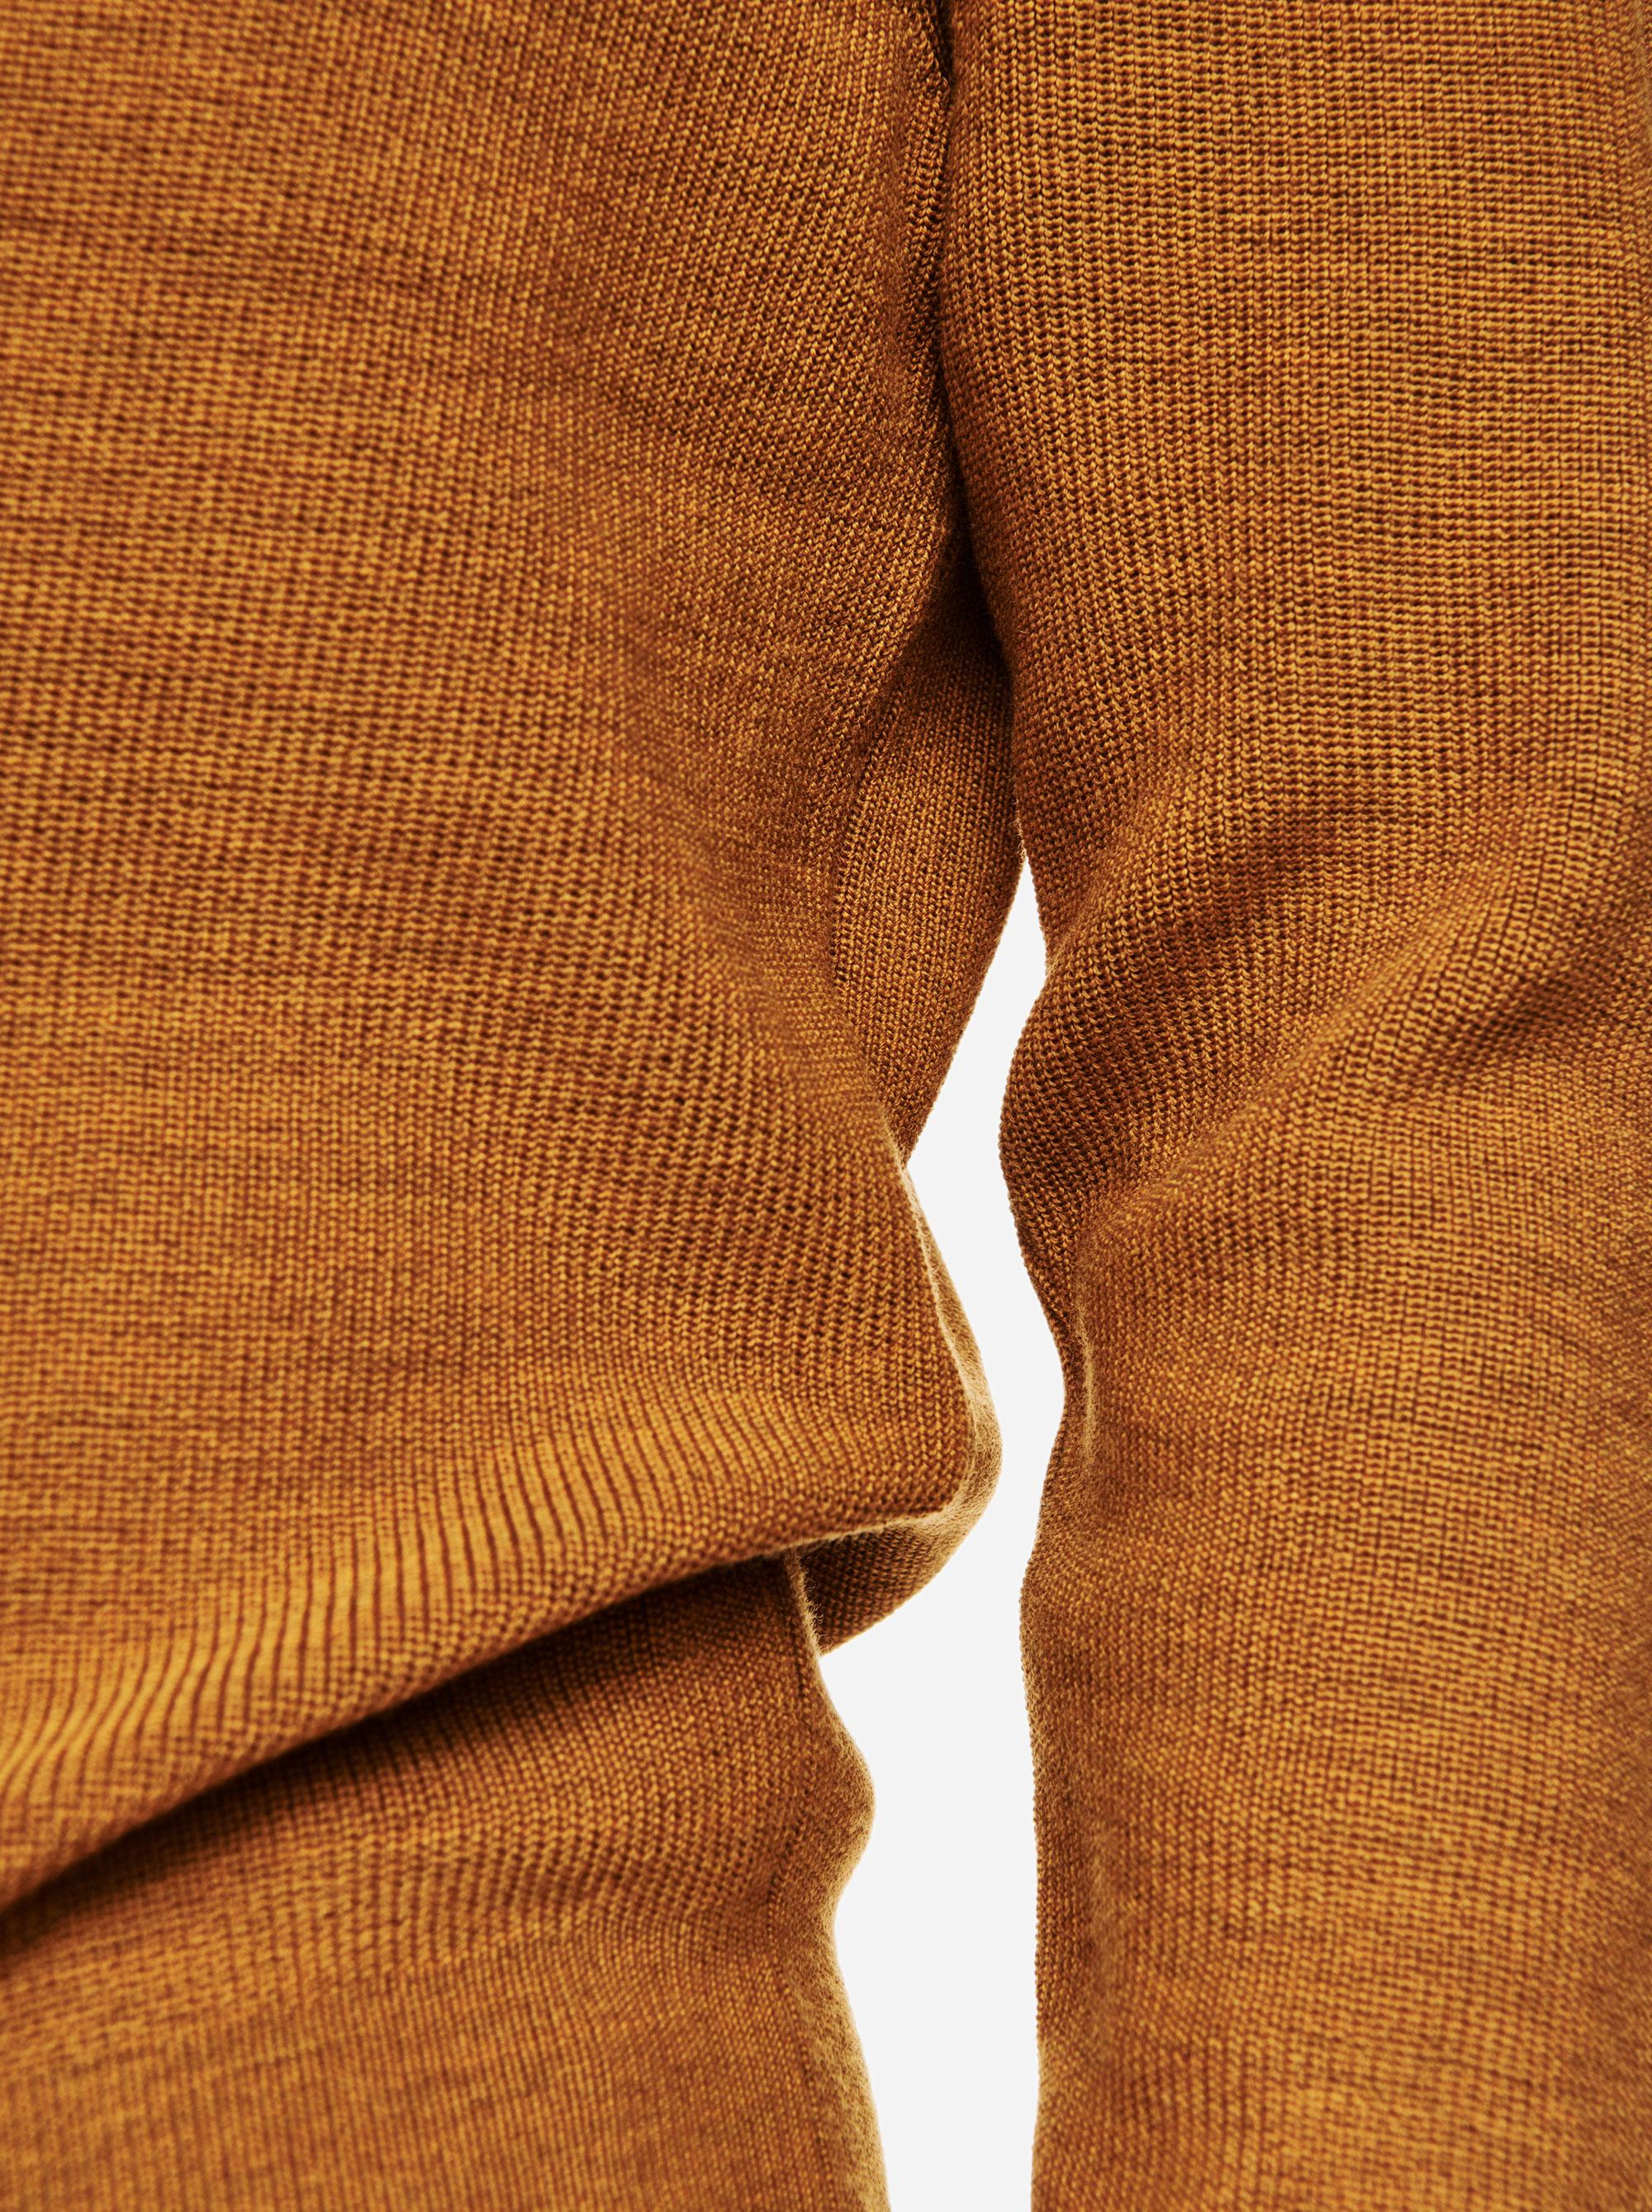 Teym - V-Neck - The Merino Sweater - Men - Mustard - 3